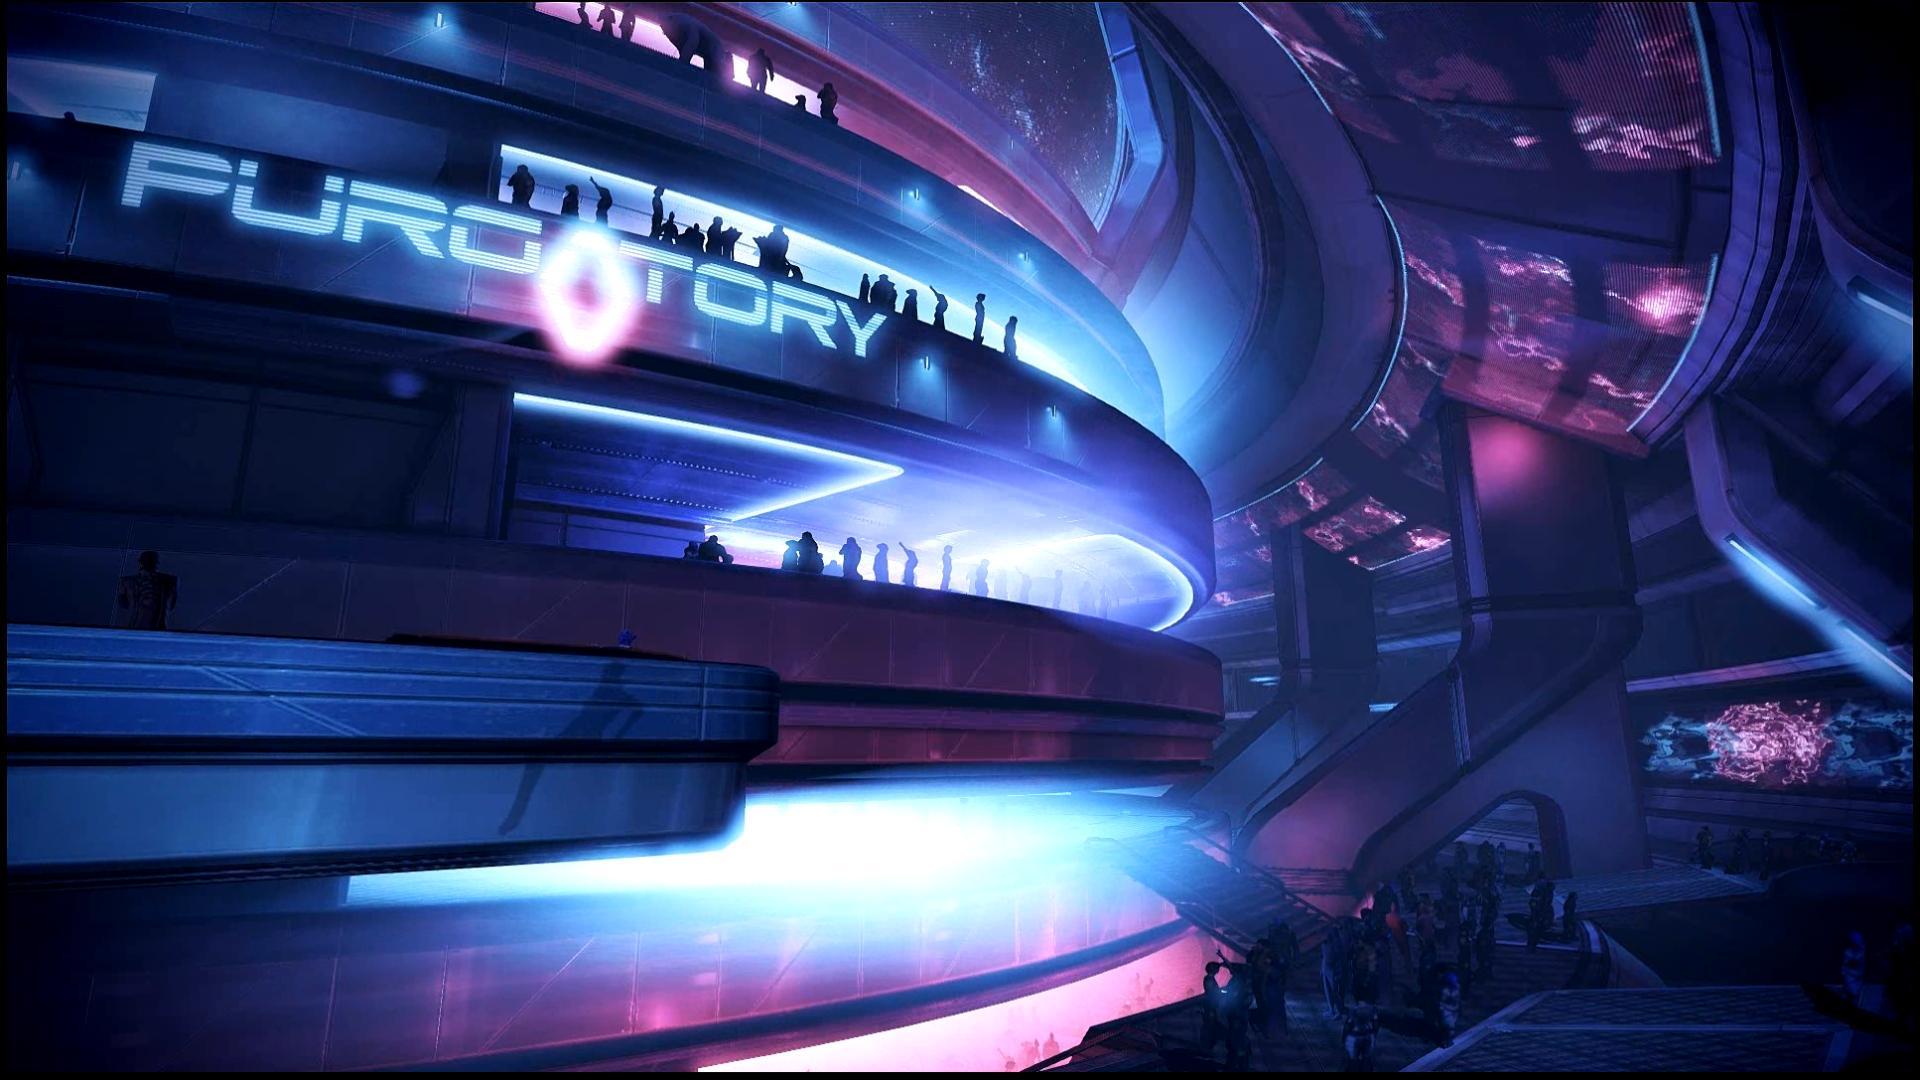 Mass Effect 3 Purgatory Dreamscene by droot1986